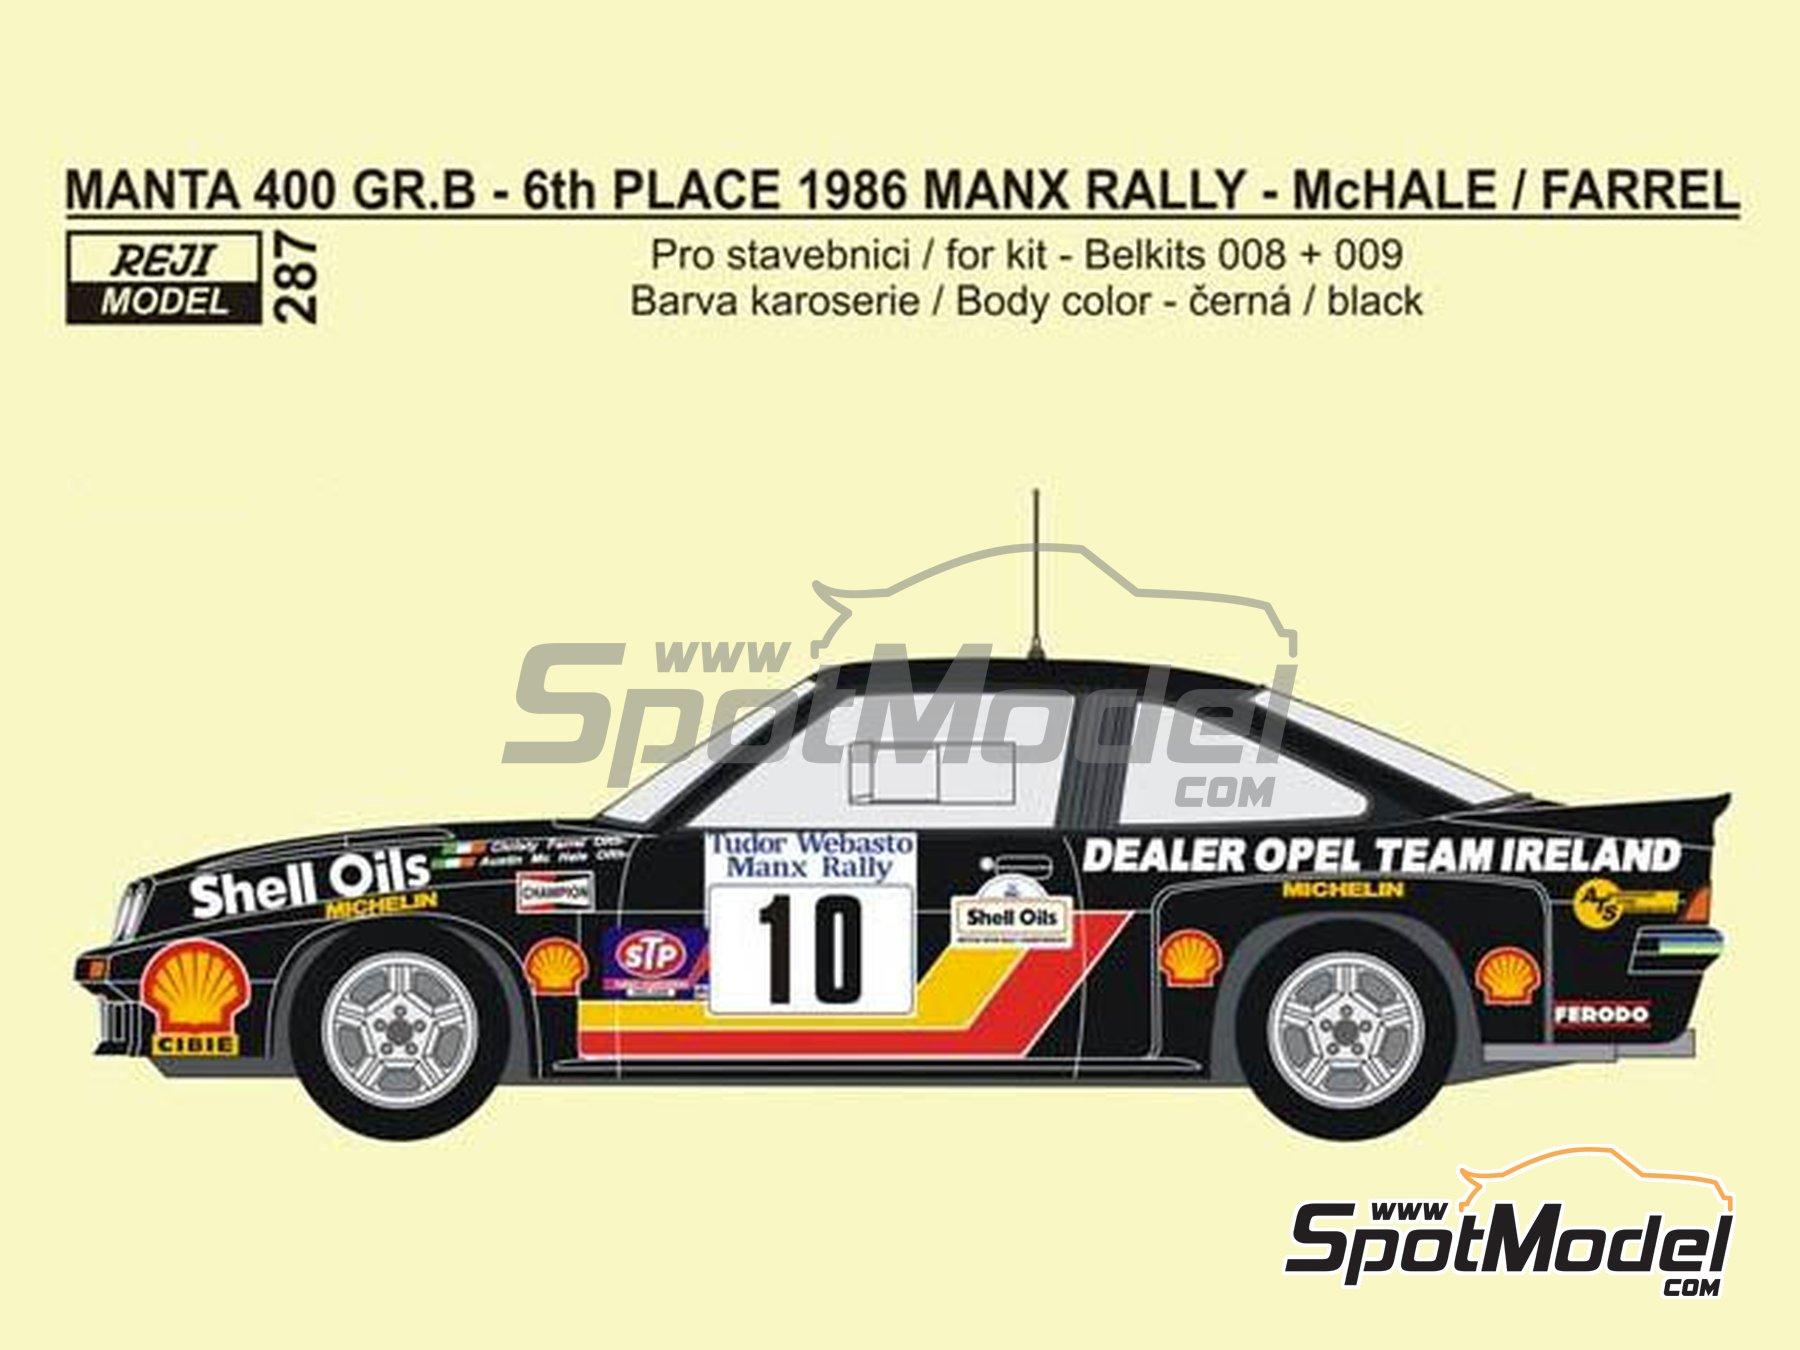 Image 1: Opel Manta 400 Group B Dealer Opel Team Ireland - Tudor Webasto Manx International Rally 1986 | Marking / livery in 1/24 scale manufactured by Reji Model (ref.REJI-287)